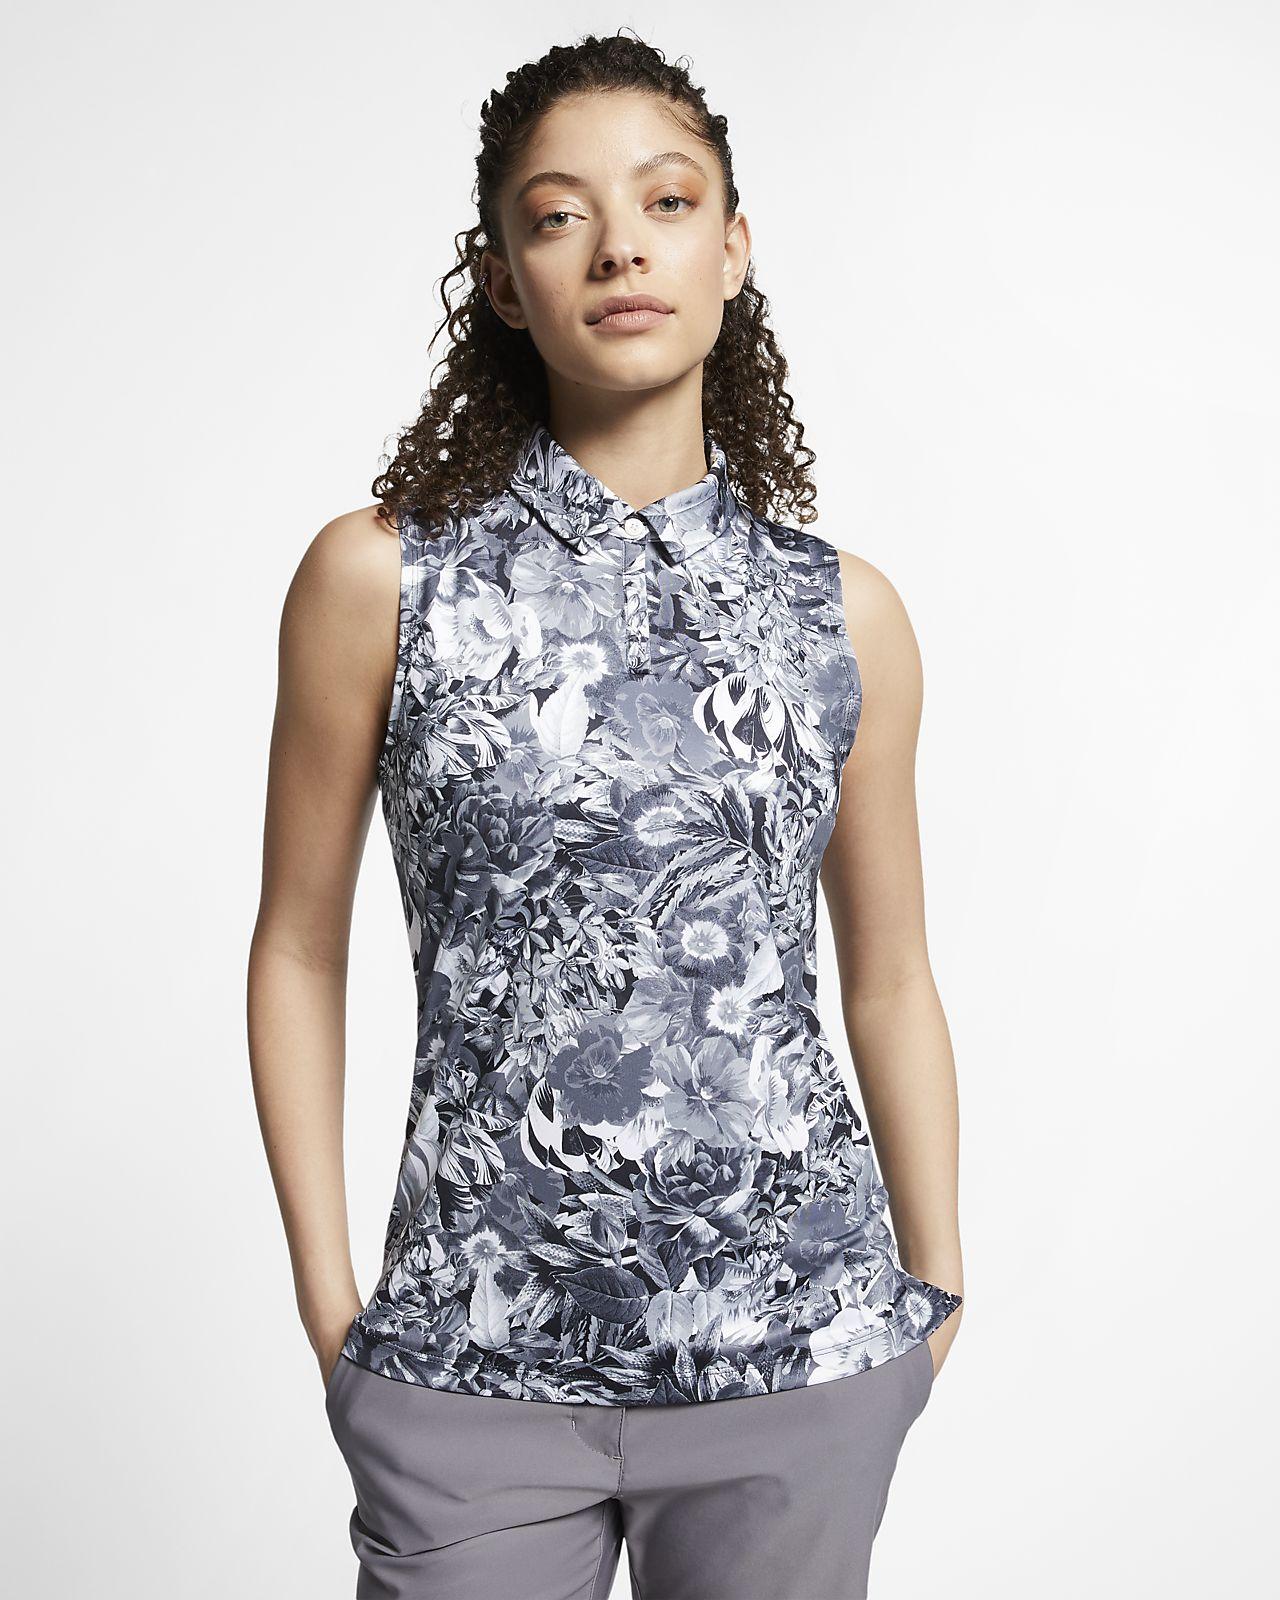 710d95e59d2c Γυναικεία αμάνικη και εμπριμέ μπλούζα πόλο για γκολφ Nike Dri-FIT ...